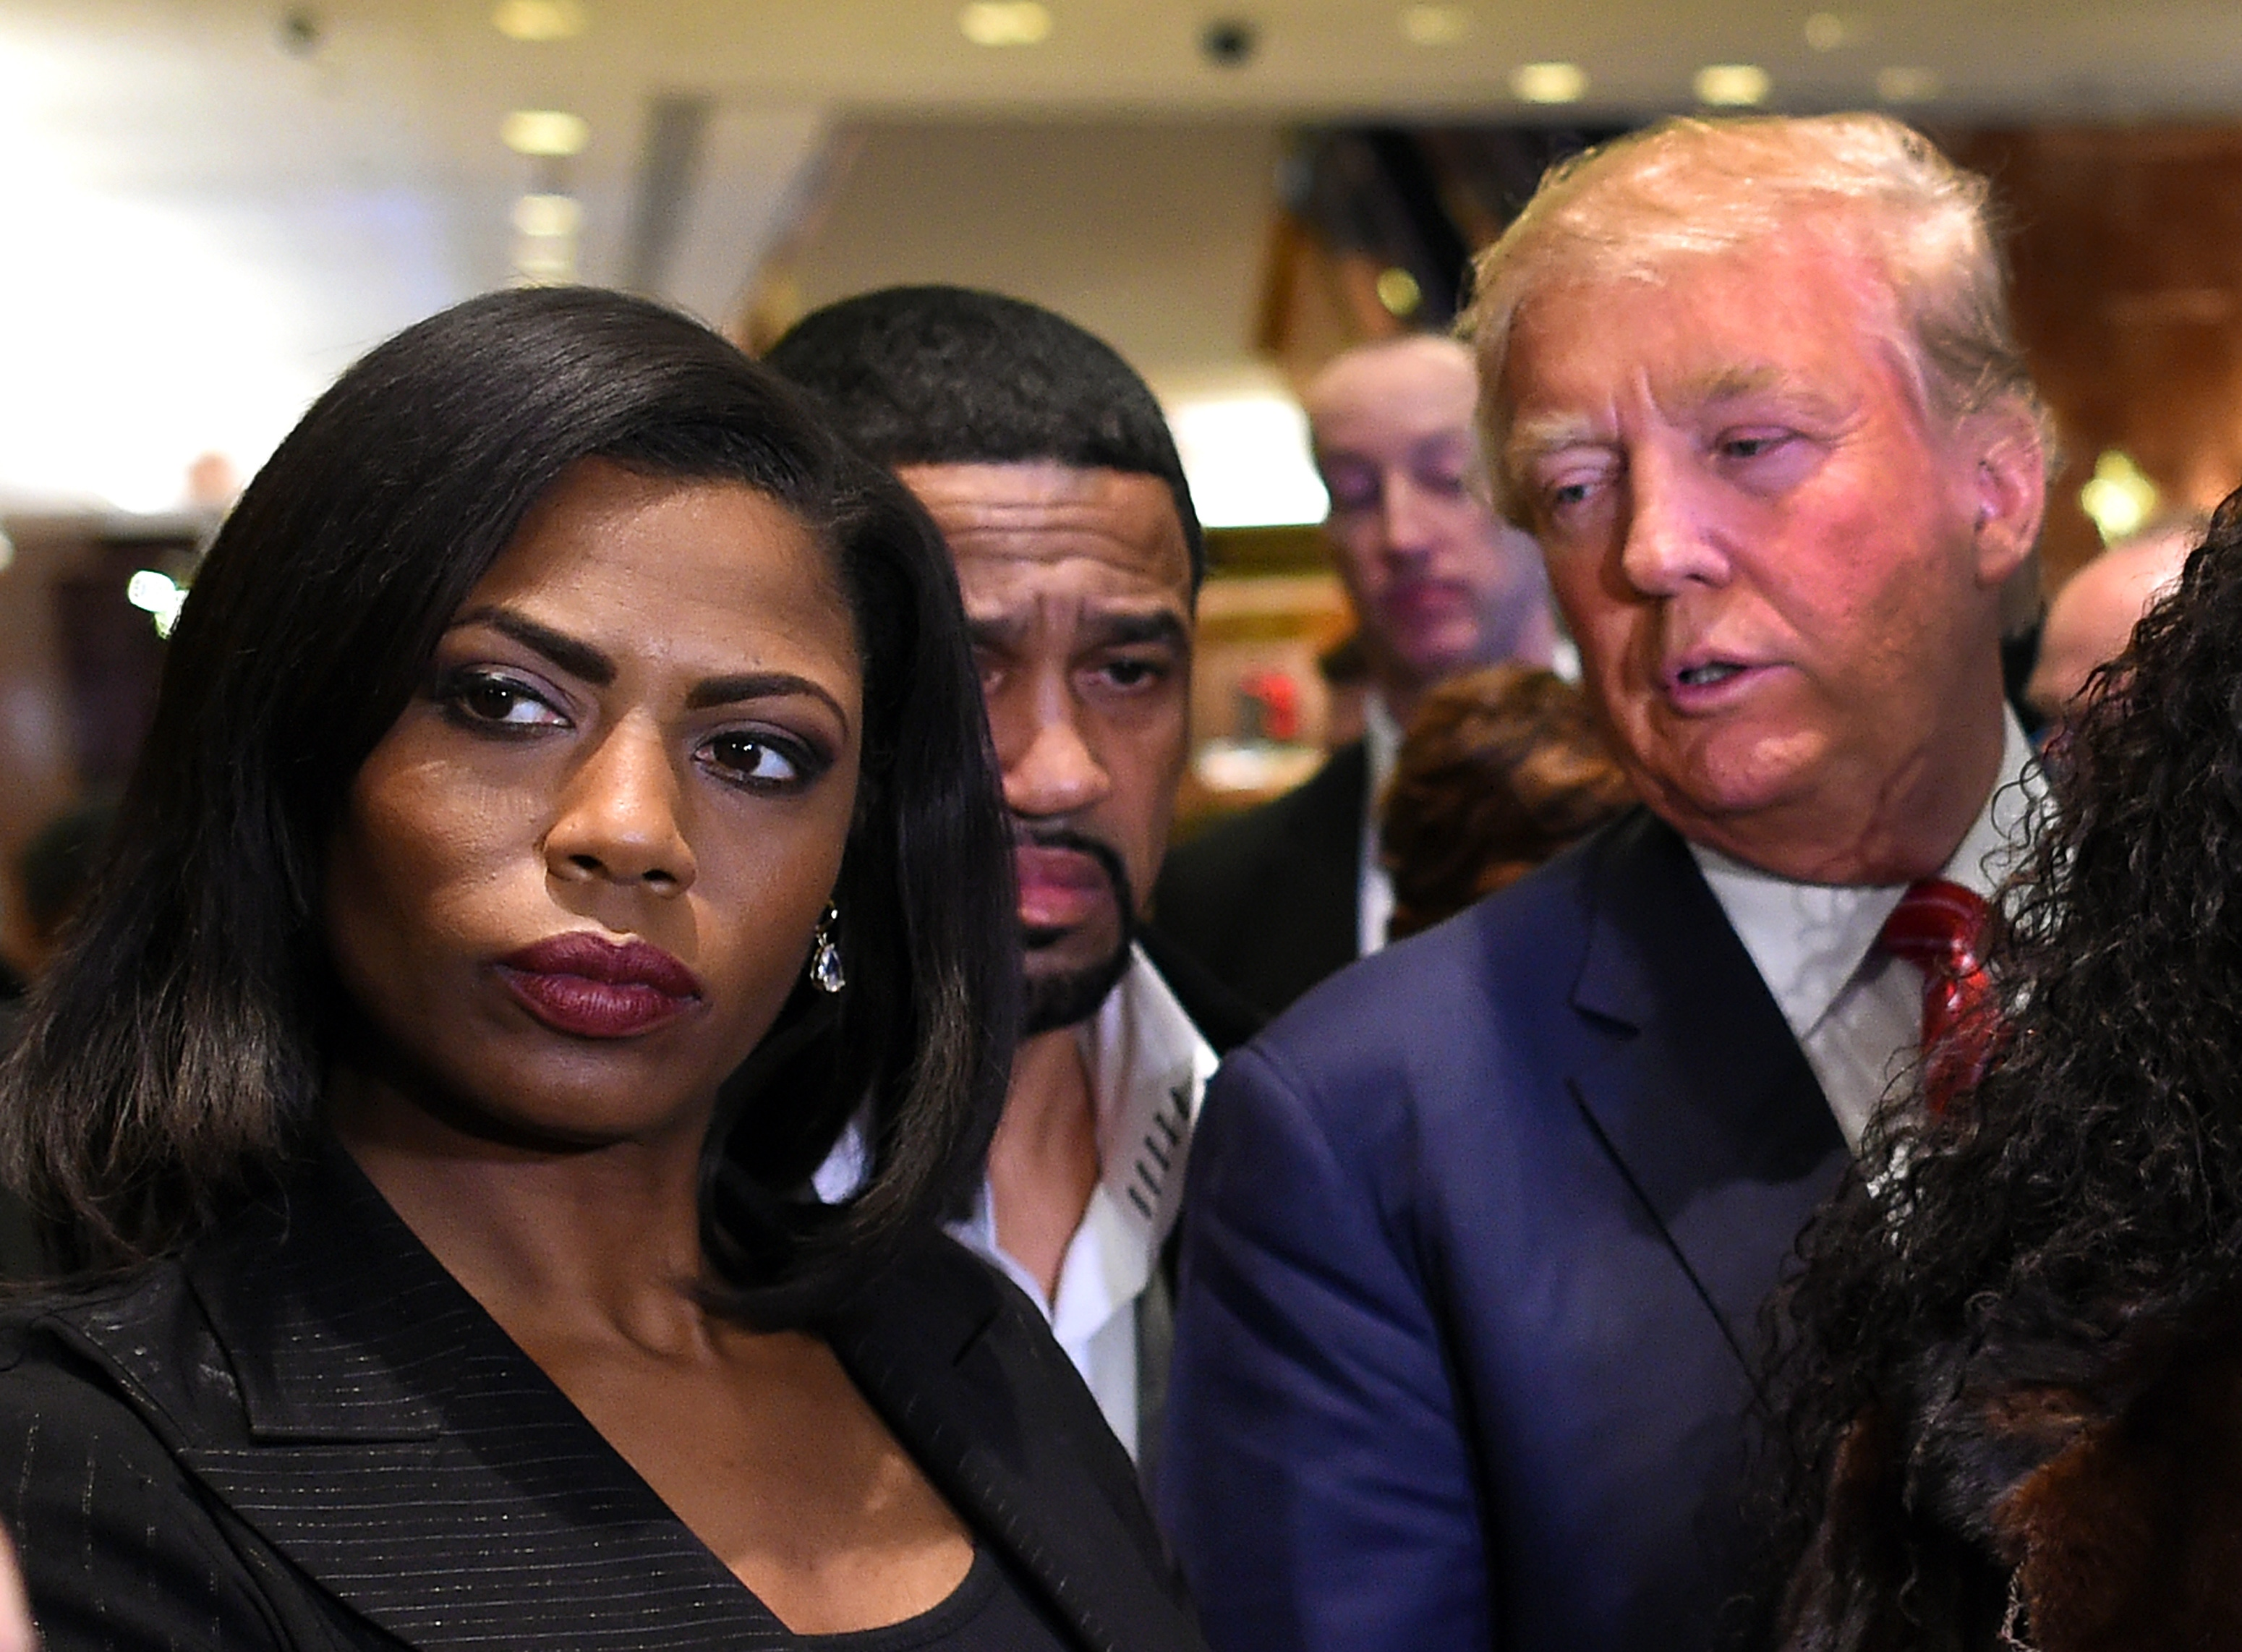 Omarosa Manigault, Donald Trump